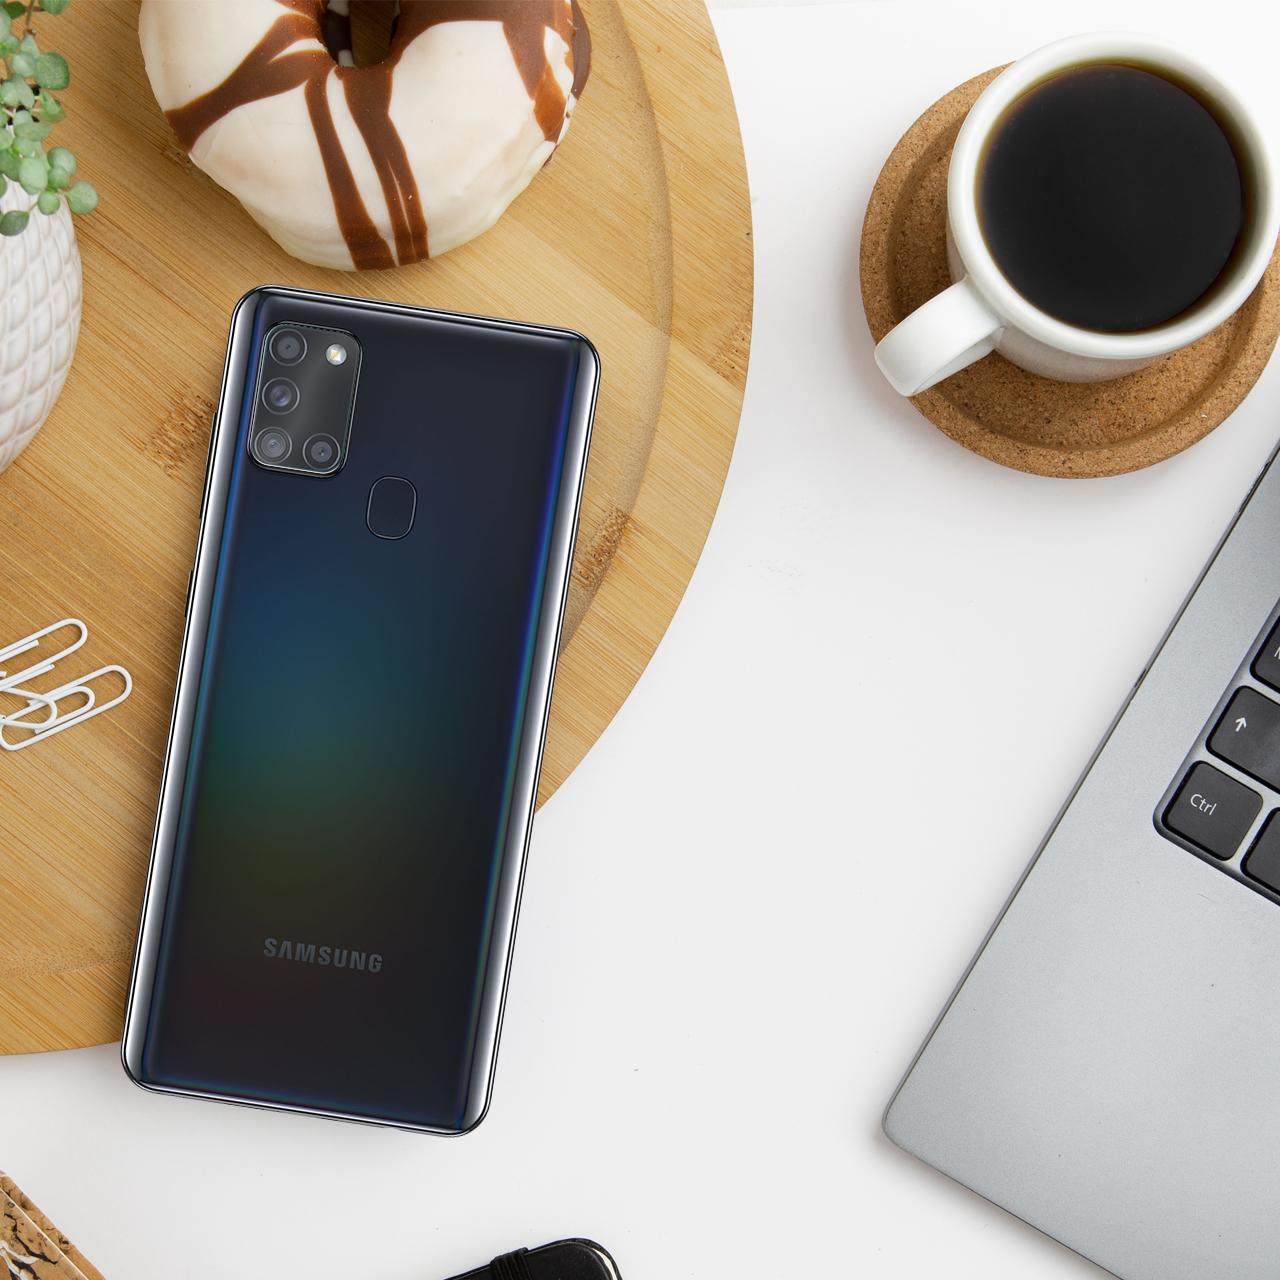 محافظ لنز دوربین سیحان مدل GLP مناسب برای گوشی موبایل سامسونگ Galaxy A21s main 1 2